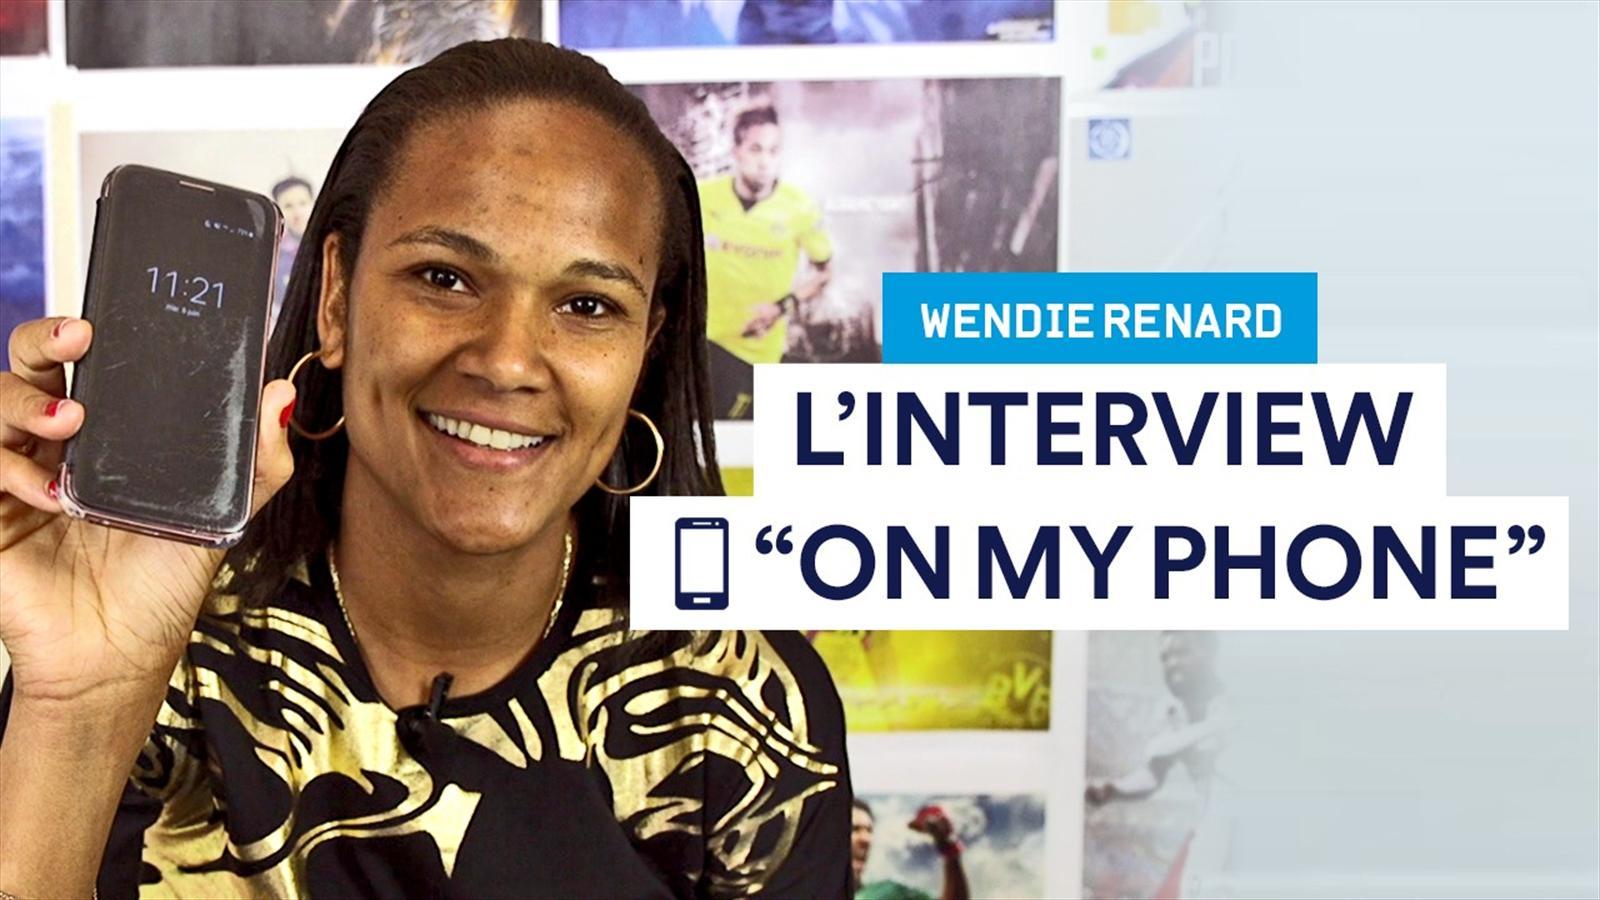 Wendy renard interview - Video Euro 2017 Bienvenue Dans Le T L Phone De Wendie Renard Euro F Video Eurosport